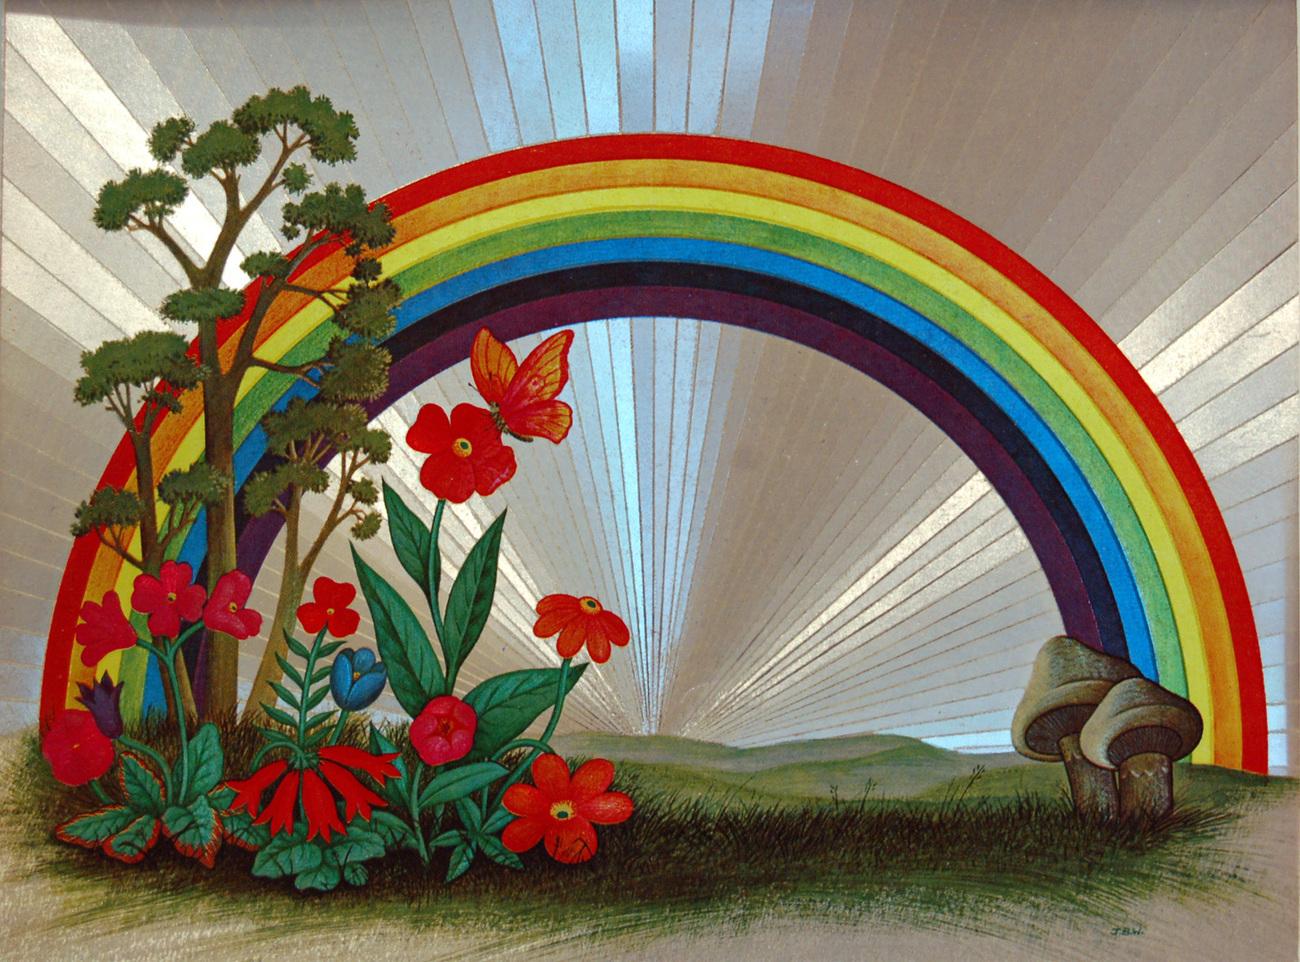 654434 rainbow with flowers